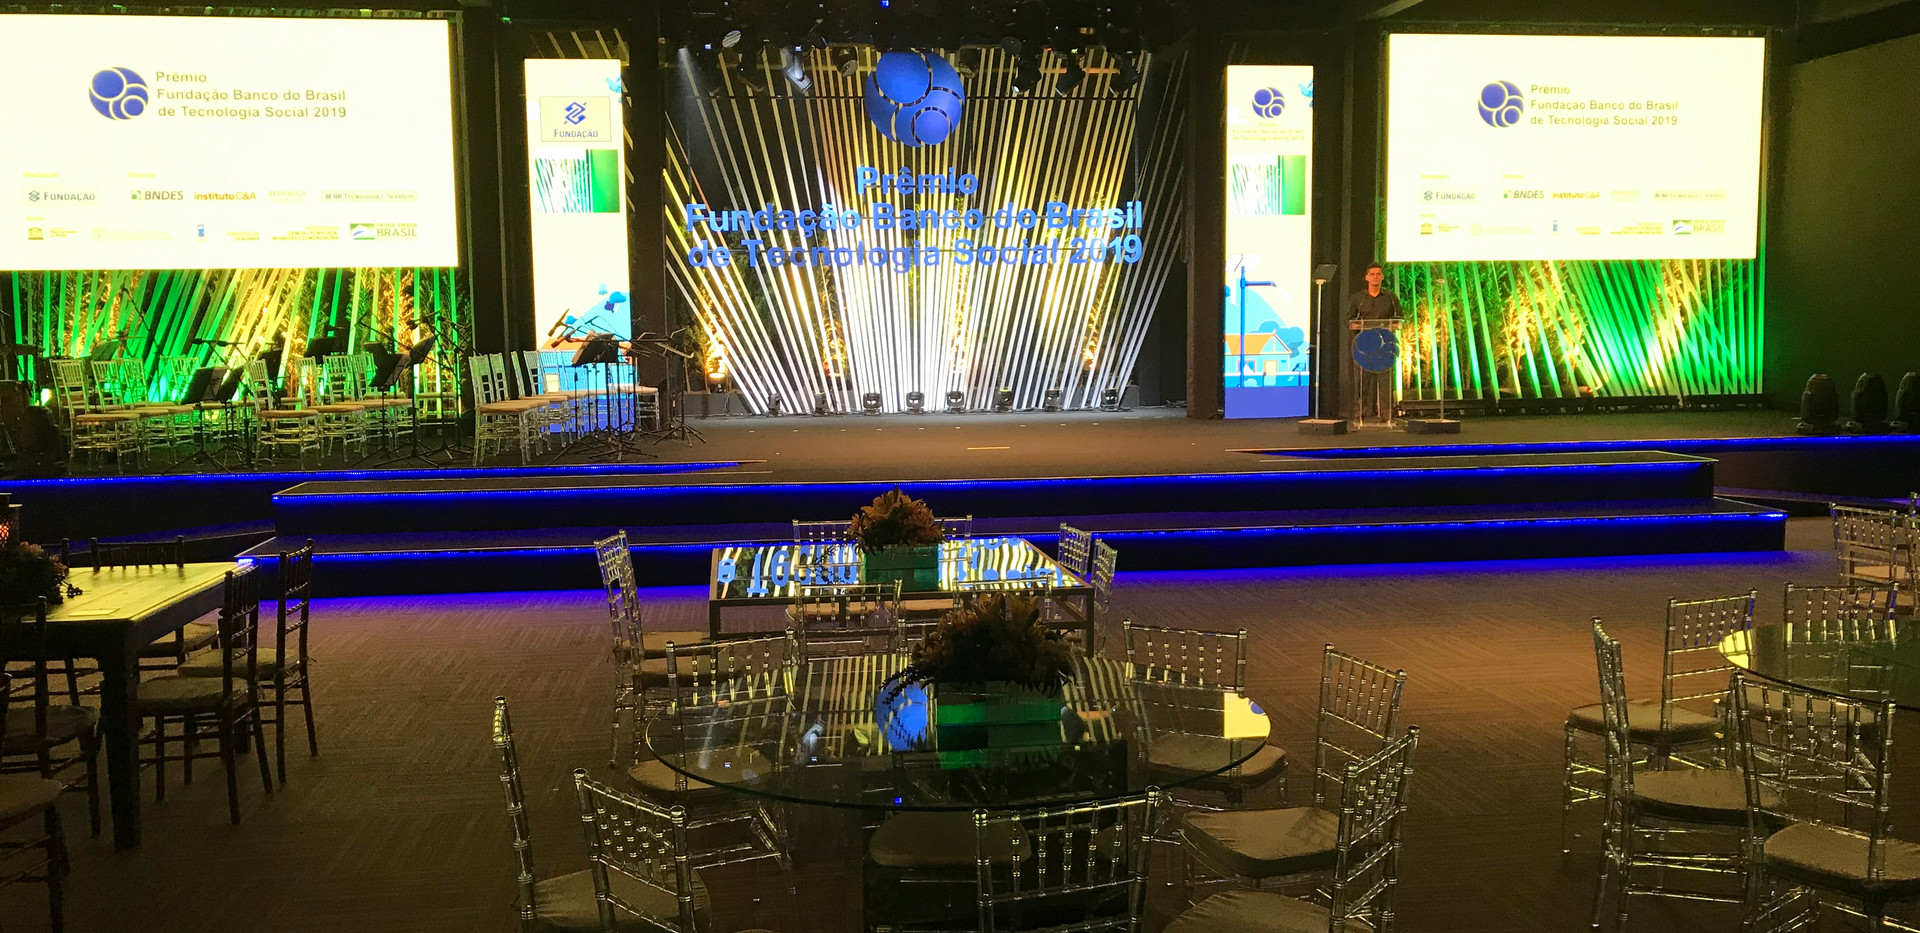 Premio_Fundacao_Banco_do_Brasil_Palco